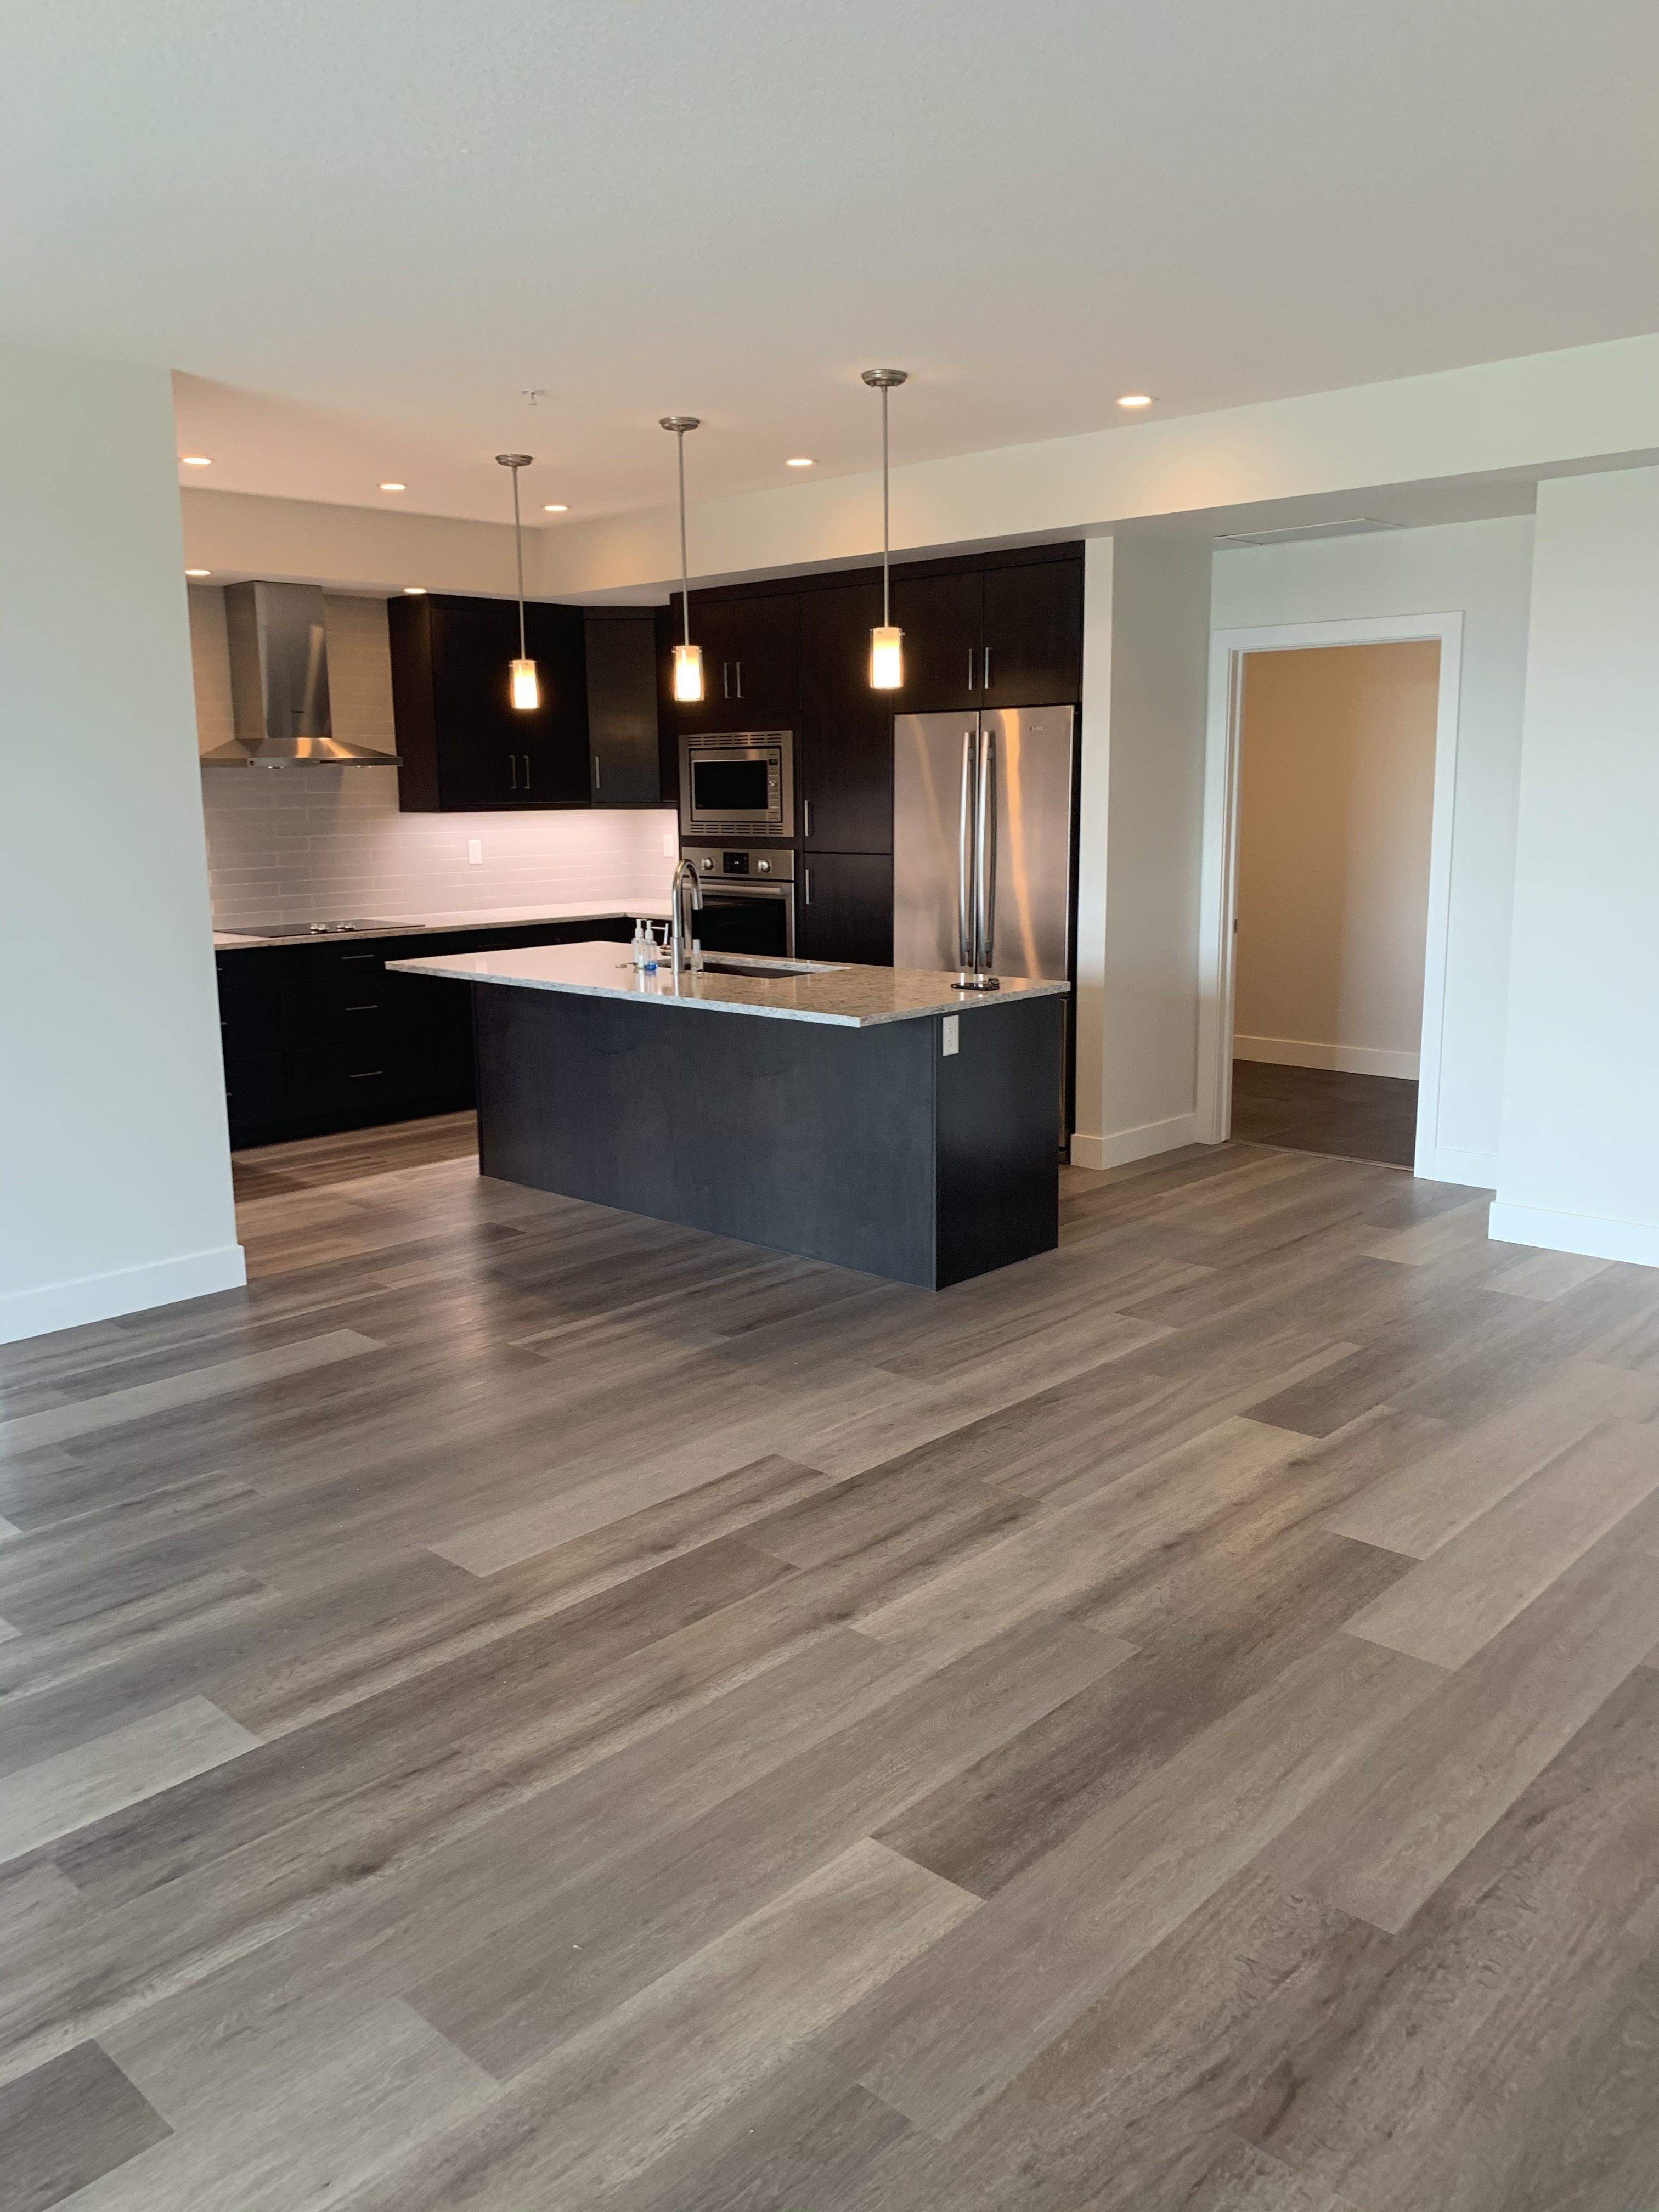 LUXURY 2 bedroom plus DEN 2 bath ADULT CONDO. ST-ALBERT BOTANICA  $2575